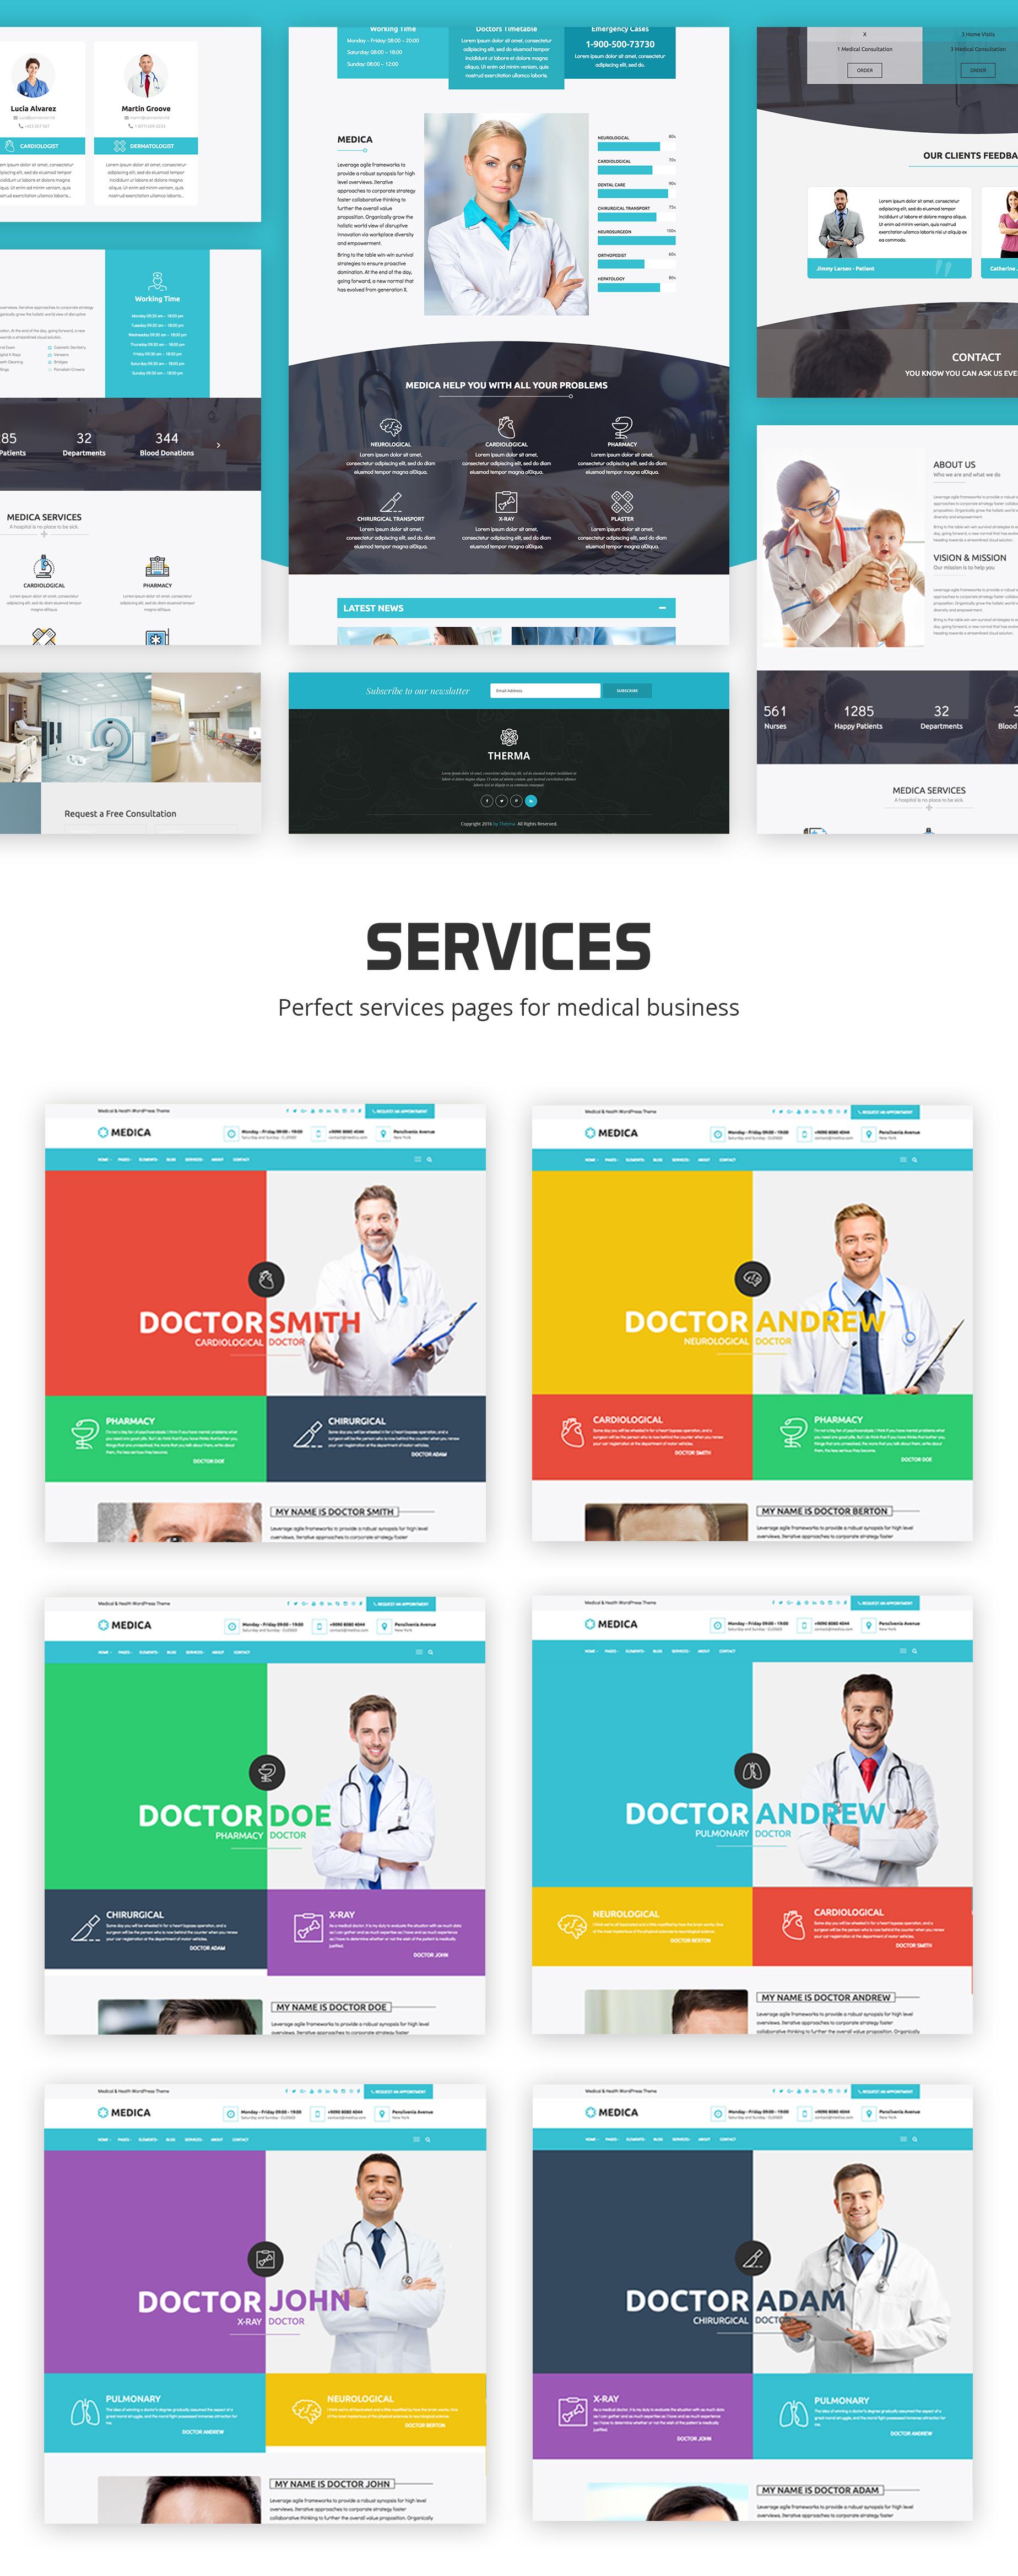 MedicaWP - A Stilish Medical / Hospital / Health WordPress Theme - 1